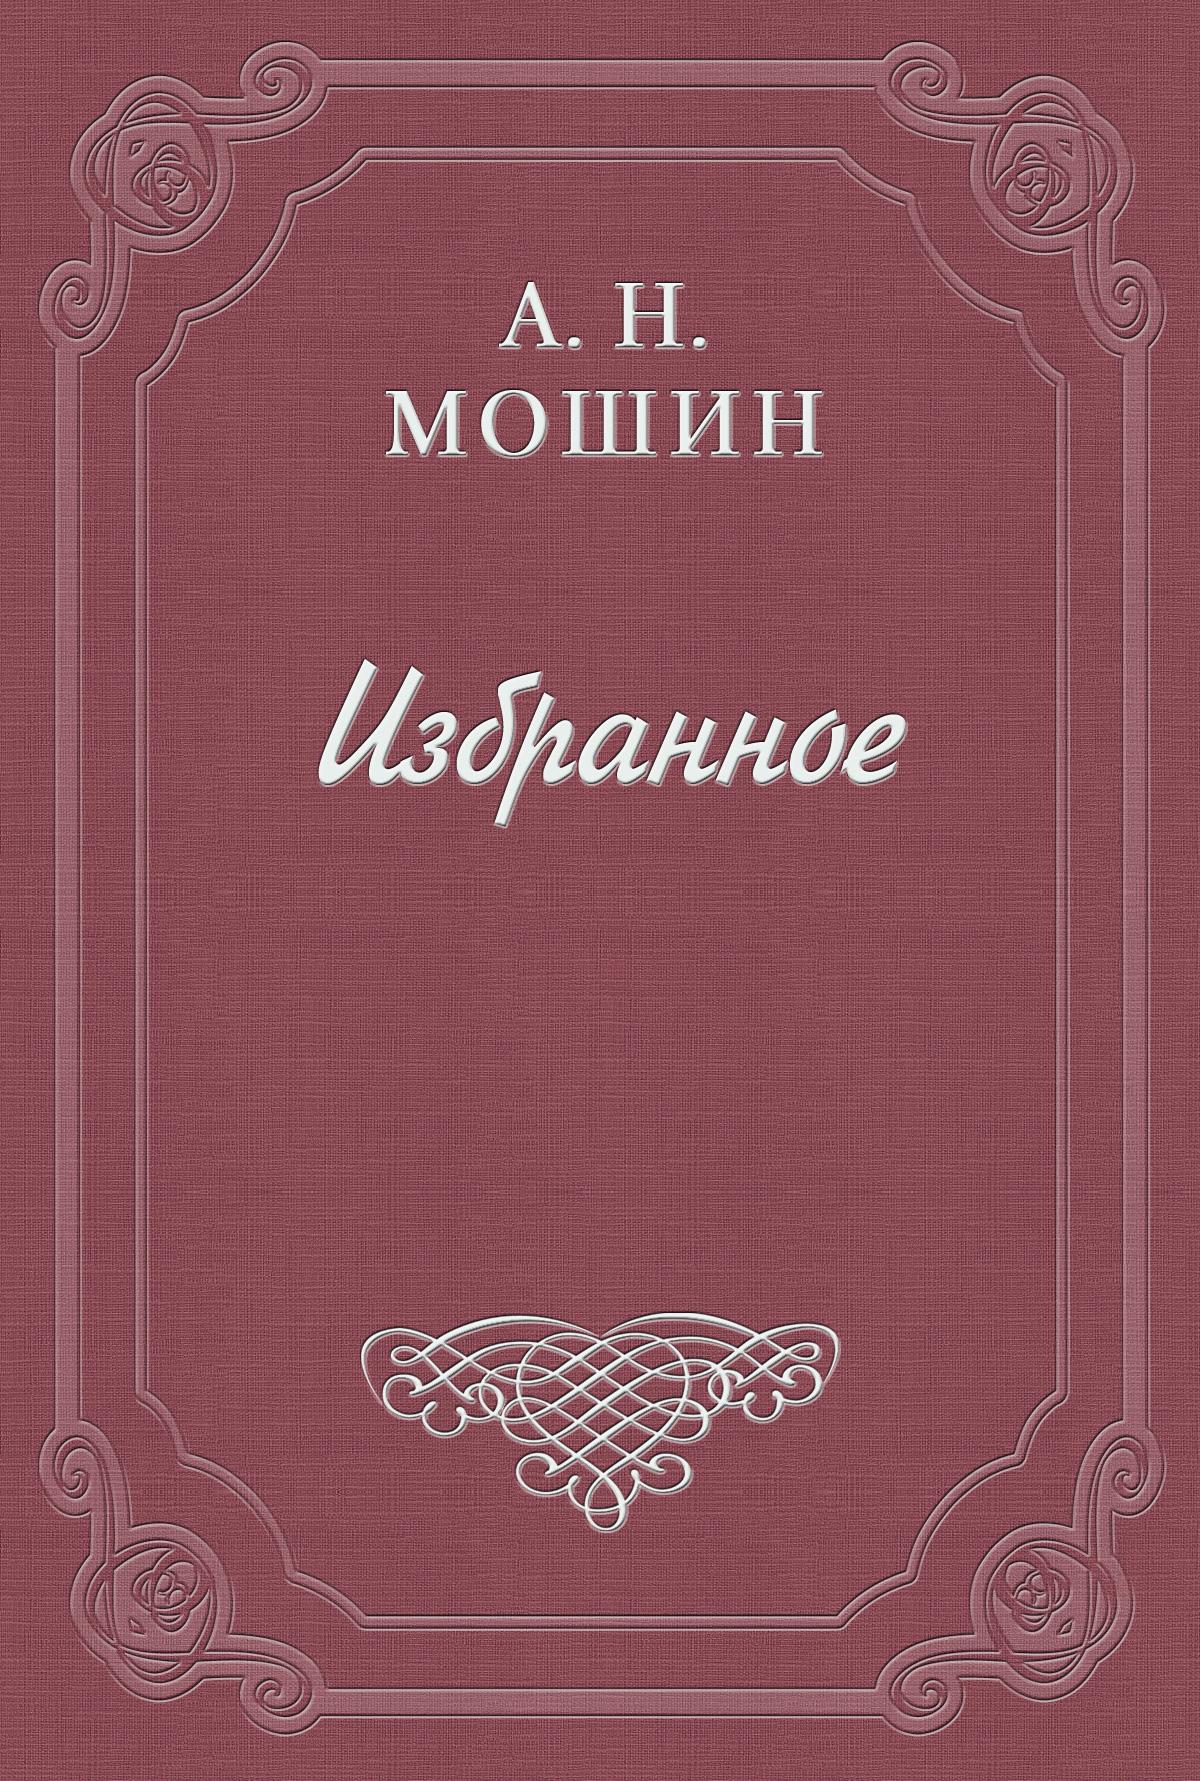 Алексей Мошин Случай алексей мошин случай page 4 page 2 page 4